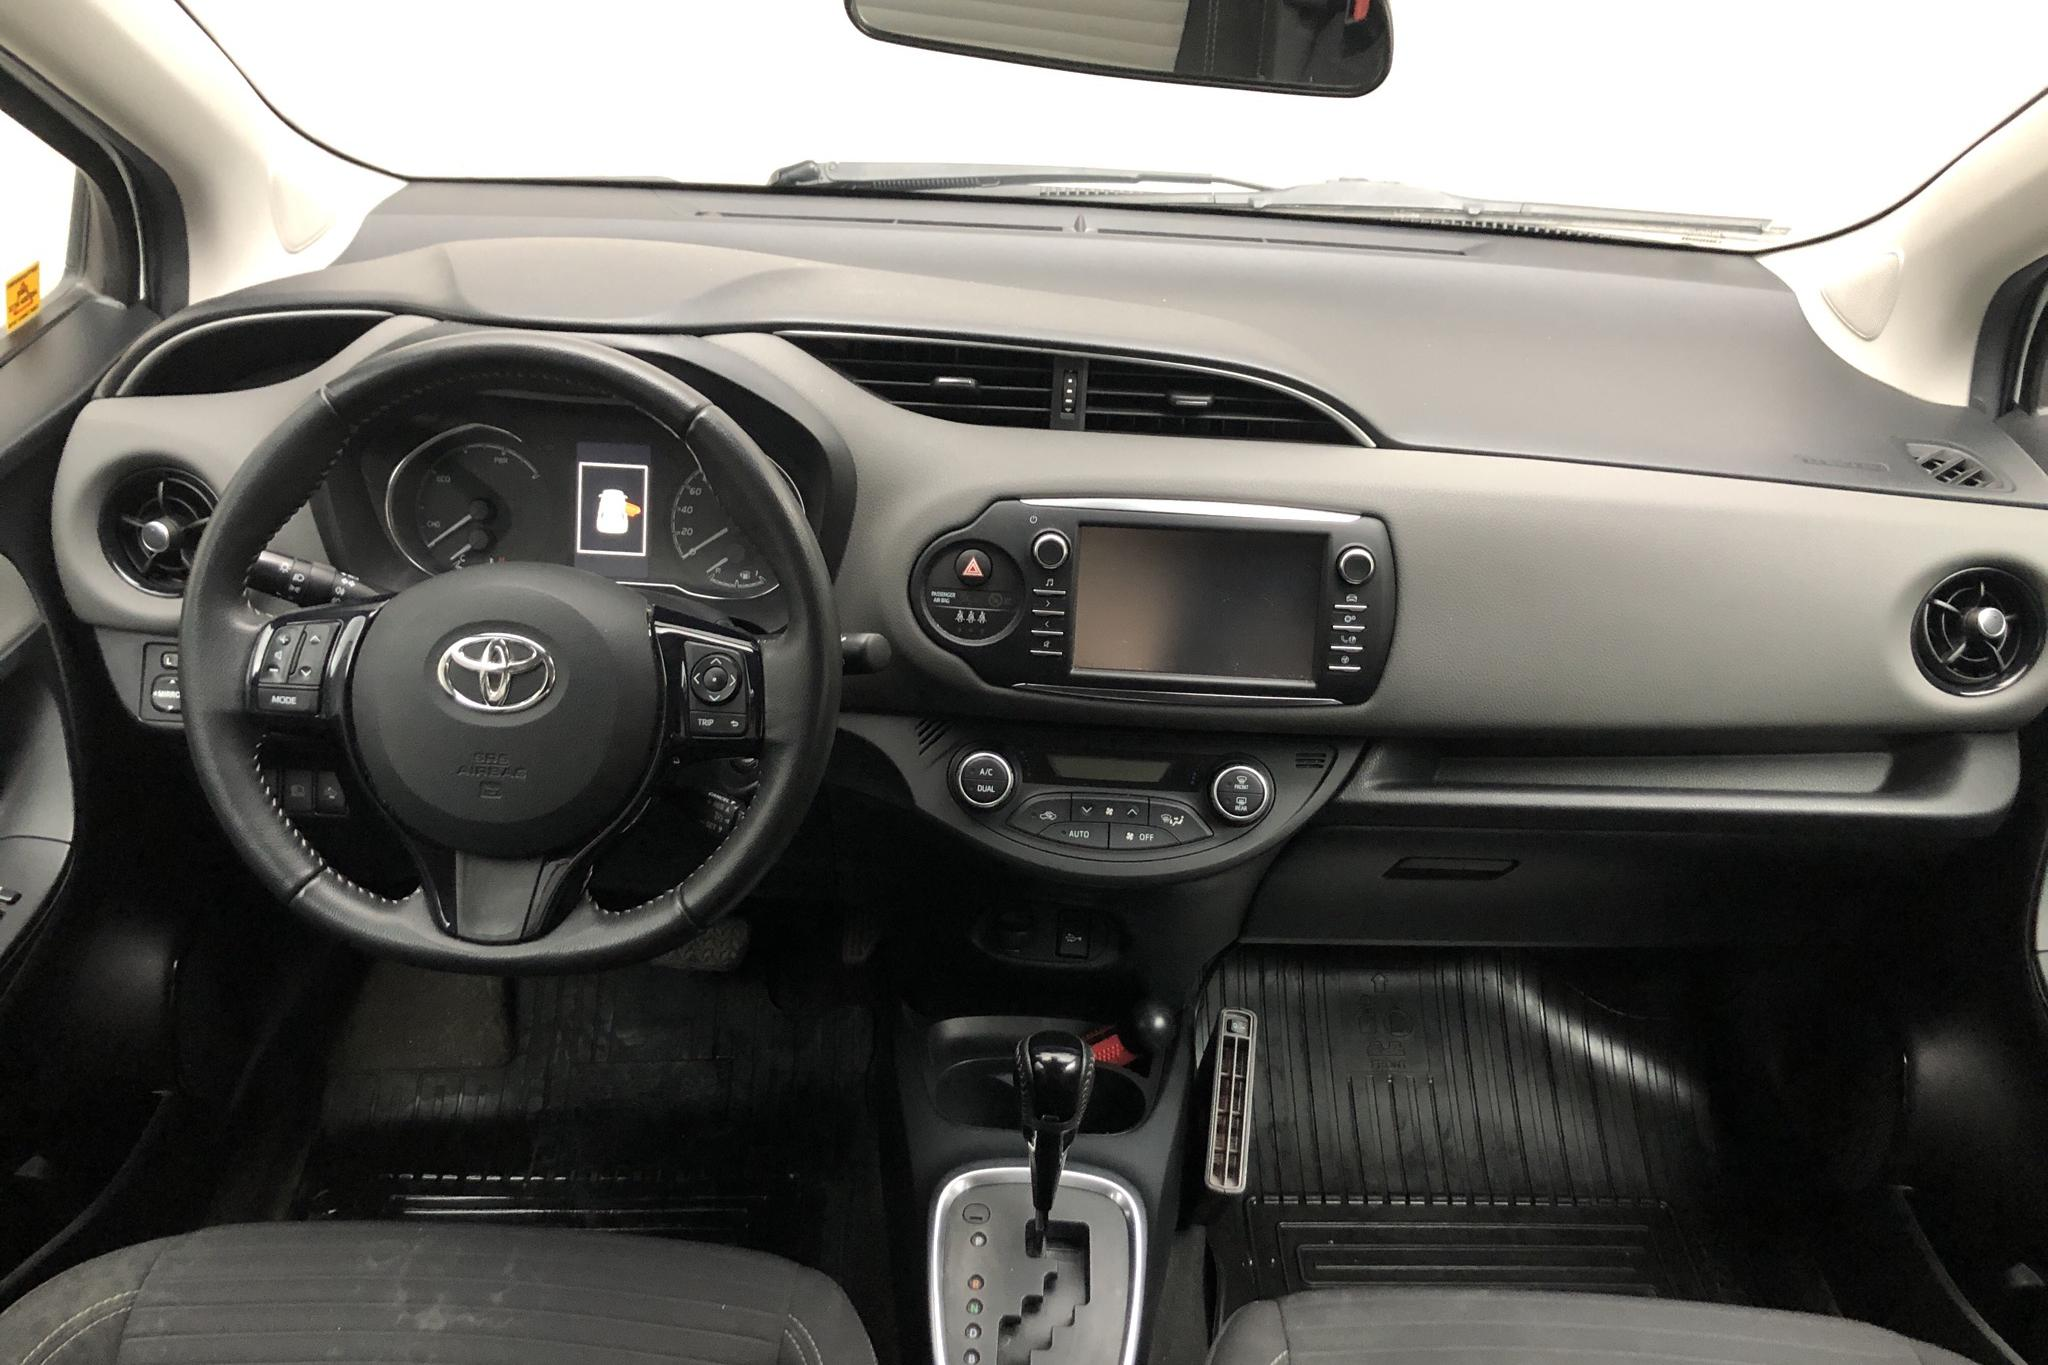 Toyota Yaris 1.5 Hybrid 5dr (101hk) - 80 770 km - Automatic - white - 2018